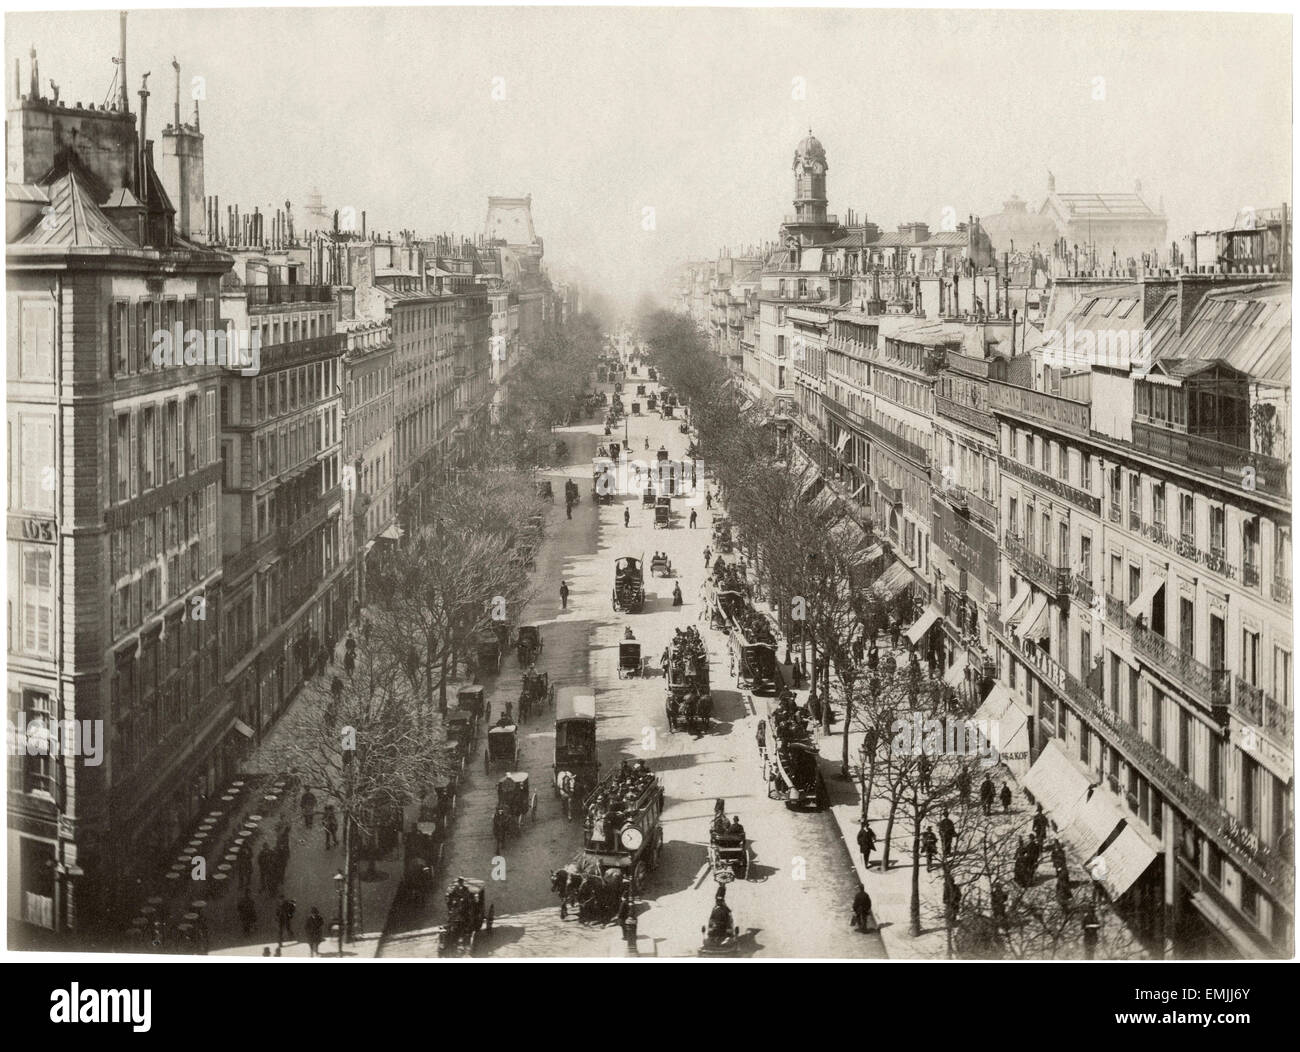 Straße Szene, Boulevard des vergoß, Paris, Frankreich, Albumen Print, um 1890 Stockbild